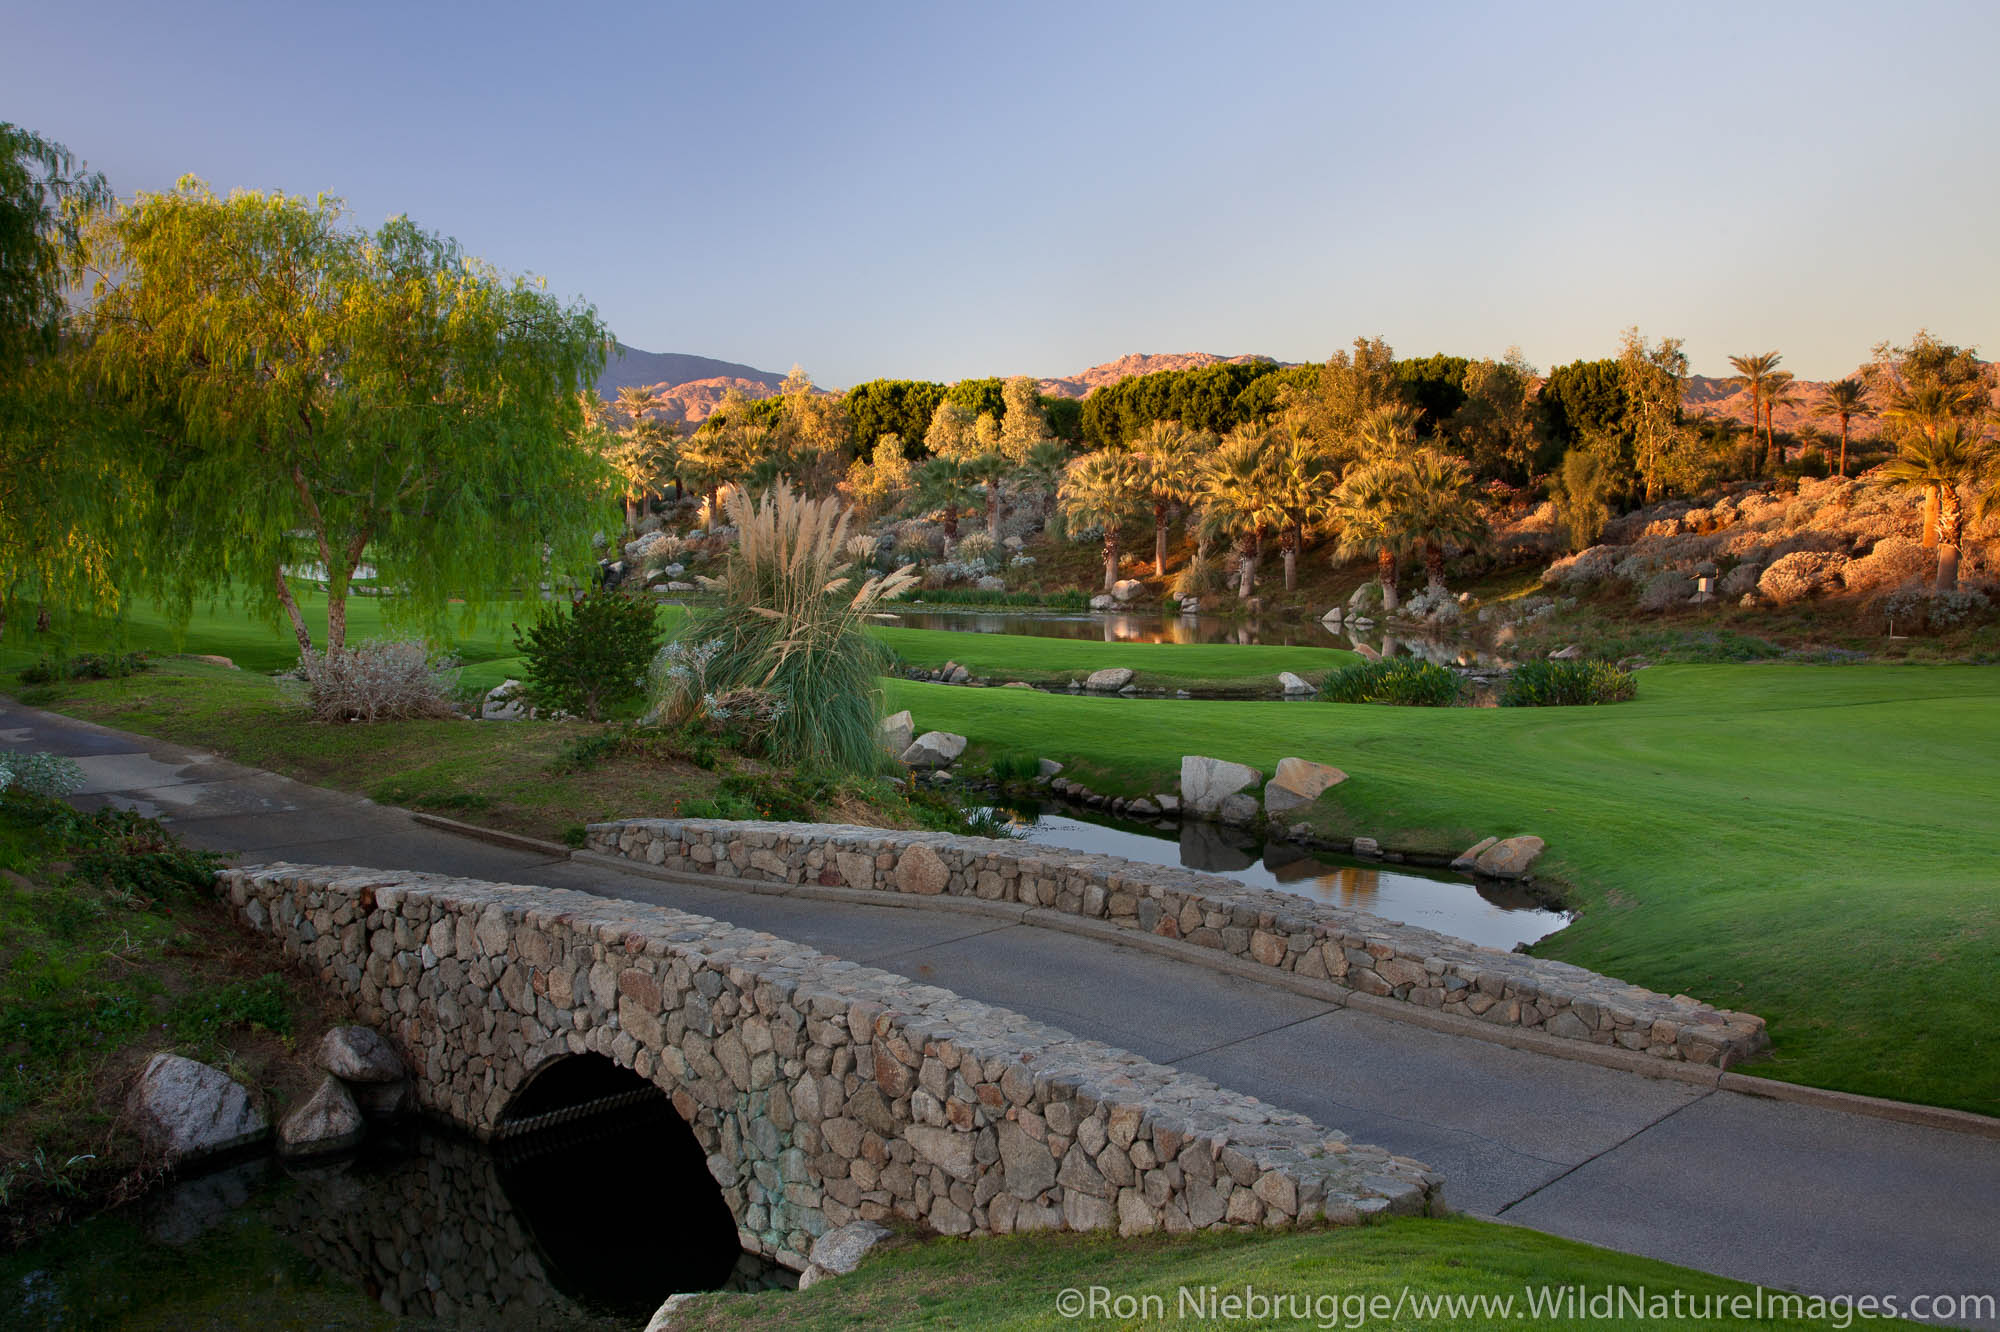 Indian Wells Golf Resort and Hyatt Grand Champions Resort, Villas and Spa, Indian Wells, CA